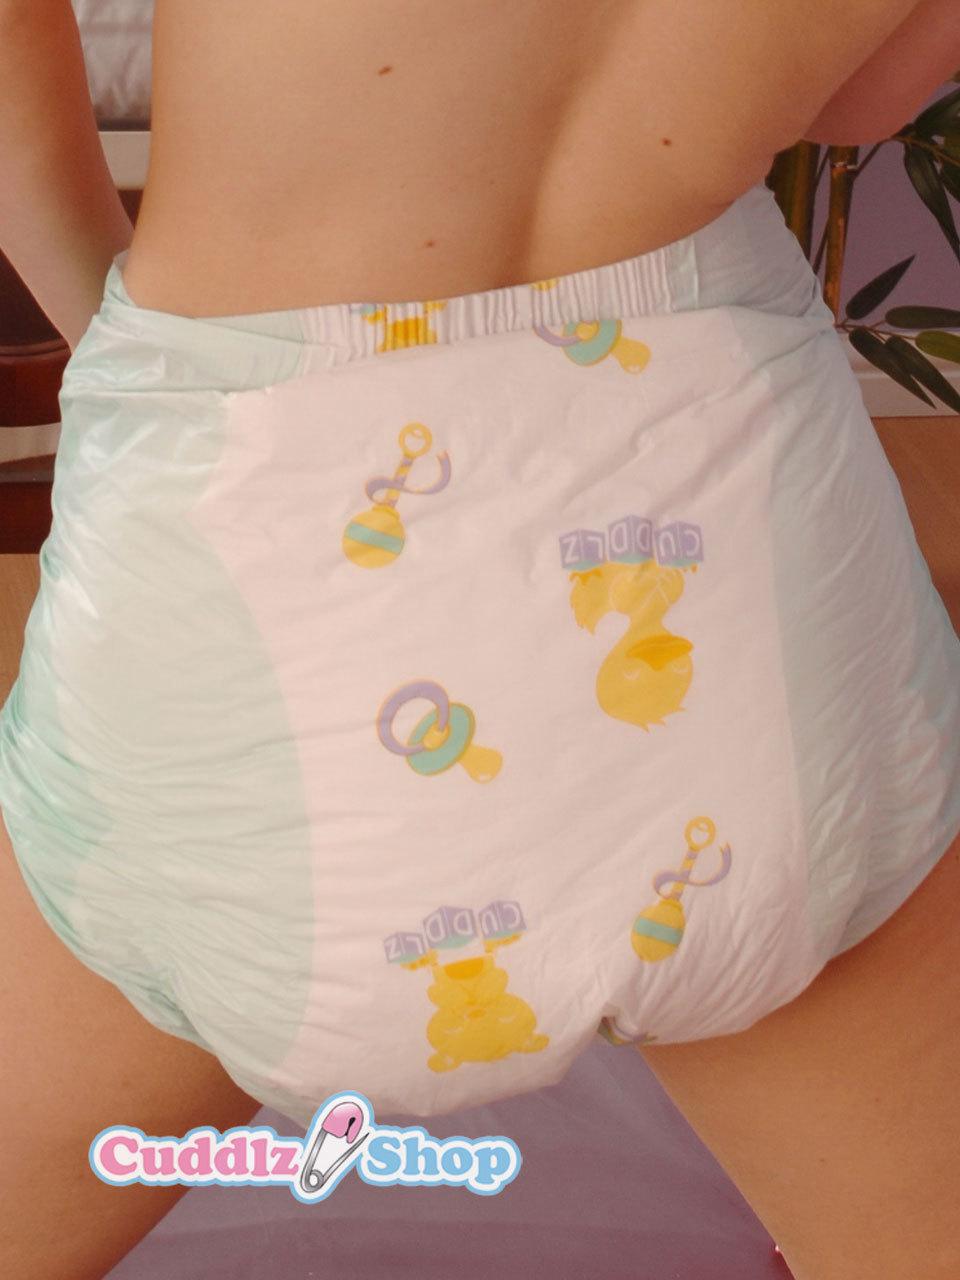 Cuddlz Adult Nursery-4288